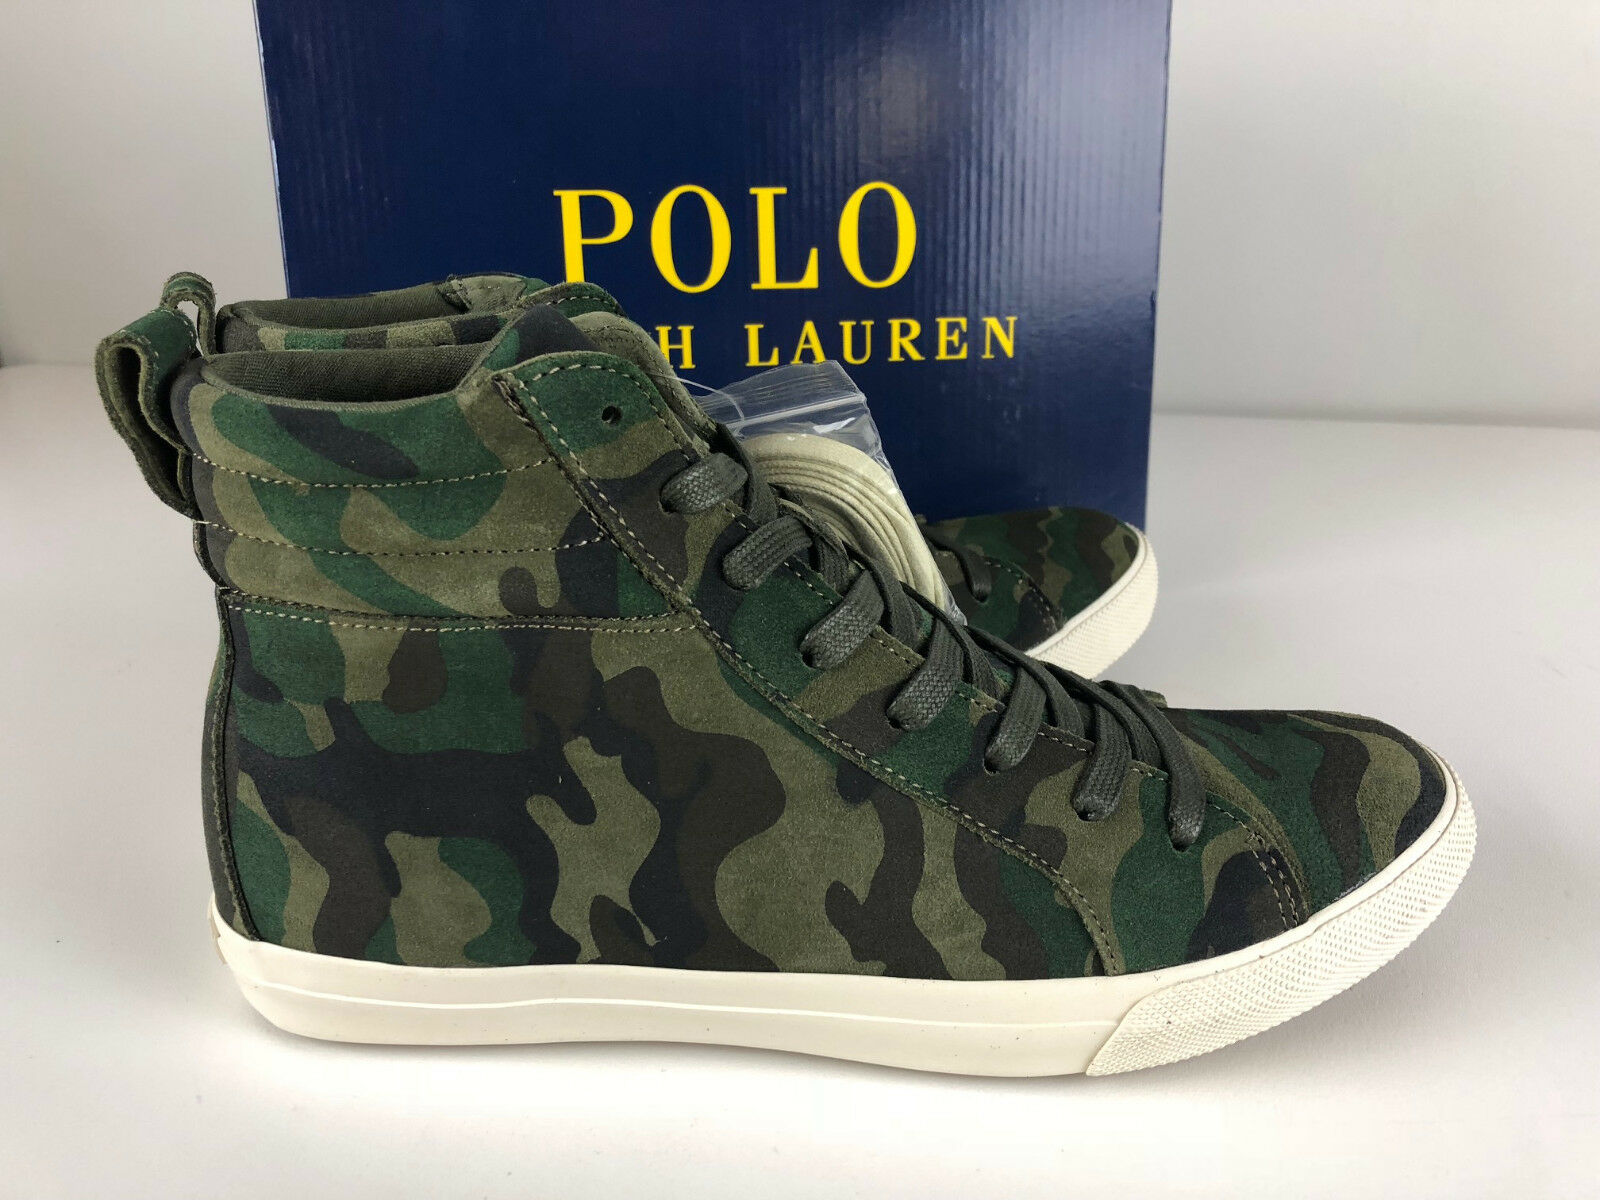 Polo Ralph Lauren Gaven Camo Suede Leather Sneaker Shoes NIB  125 Hi-Tops Polo